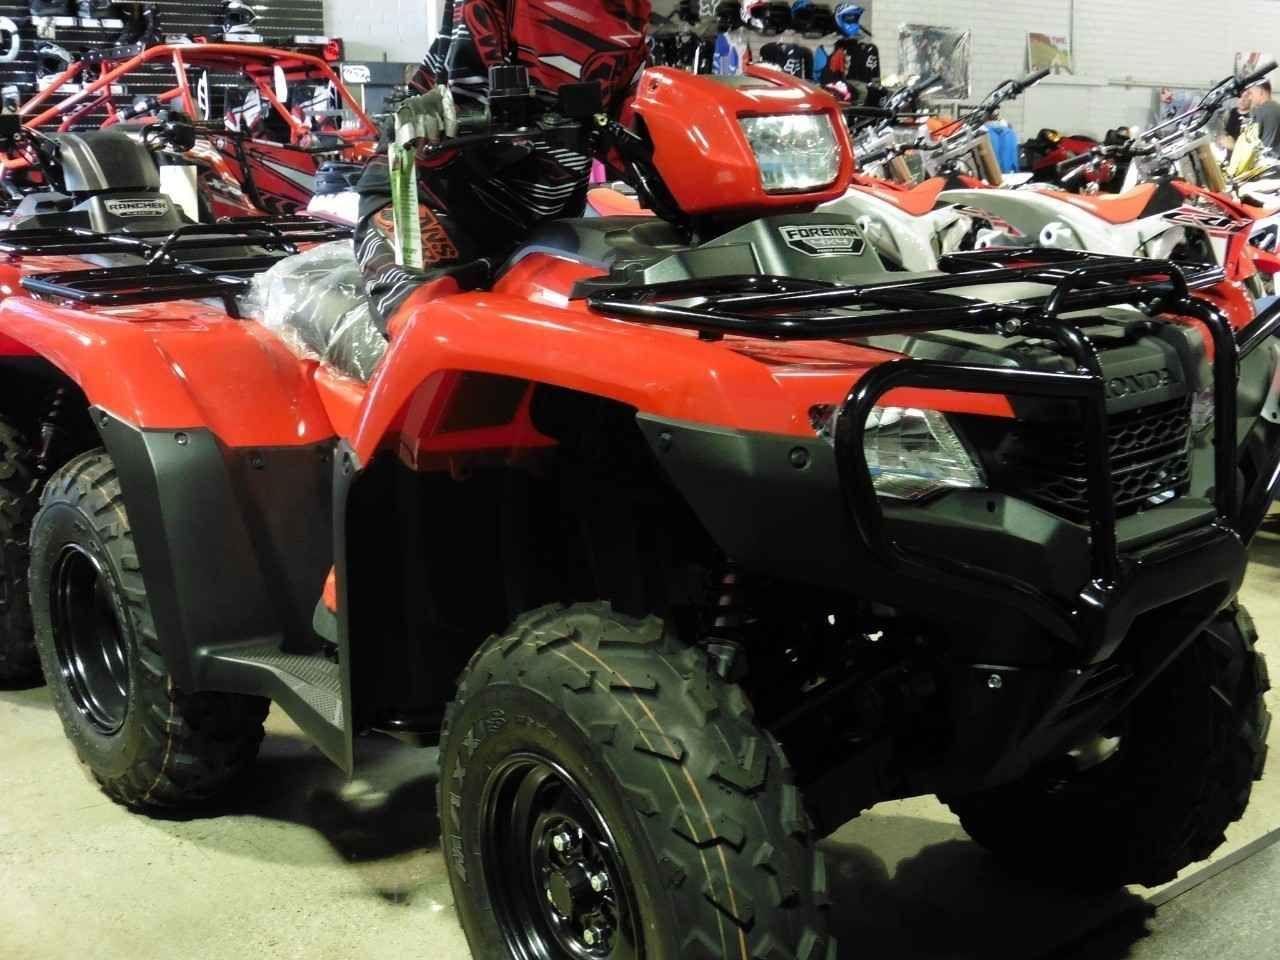 New 2015 Honda TRX 500 EX ATVs For Sale in California. 2015 HONDA TRX 500